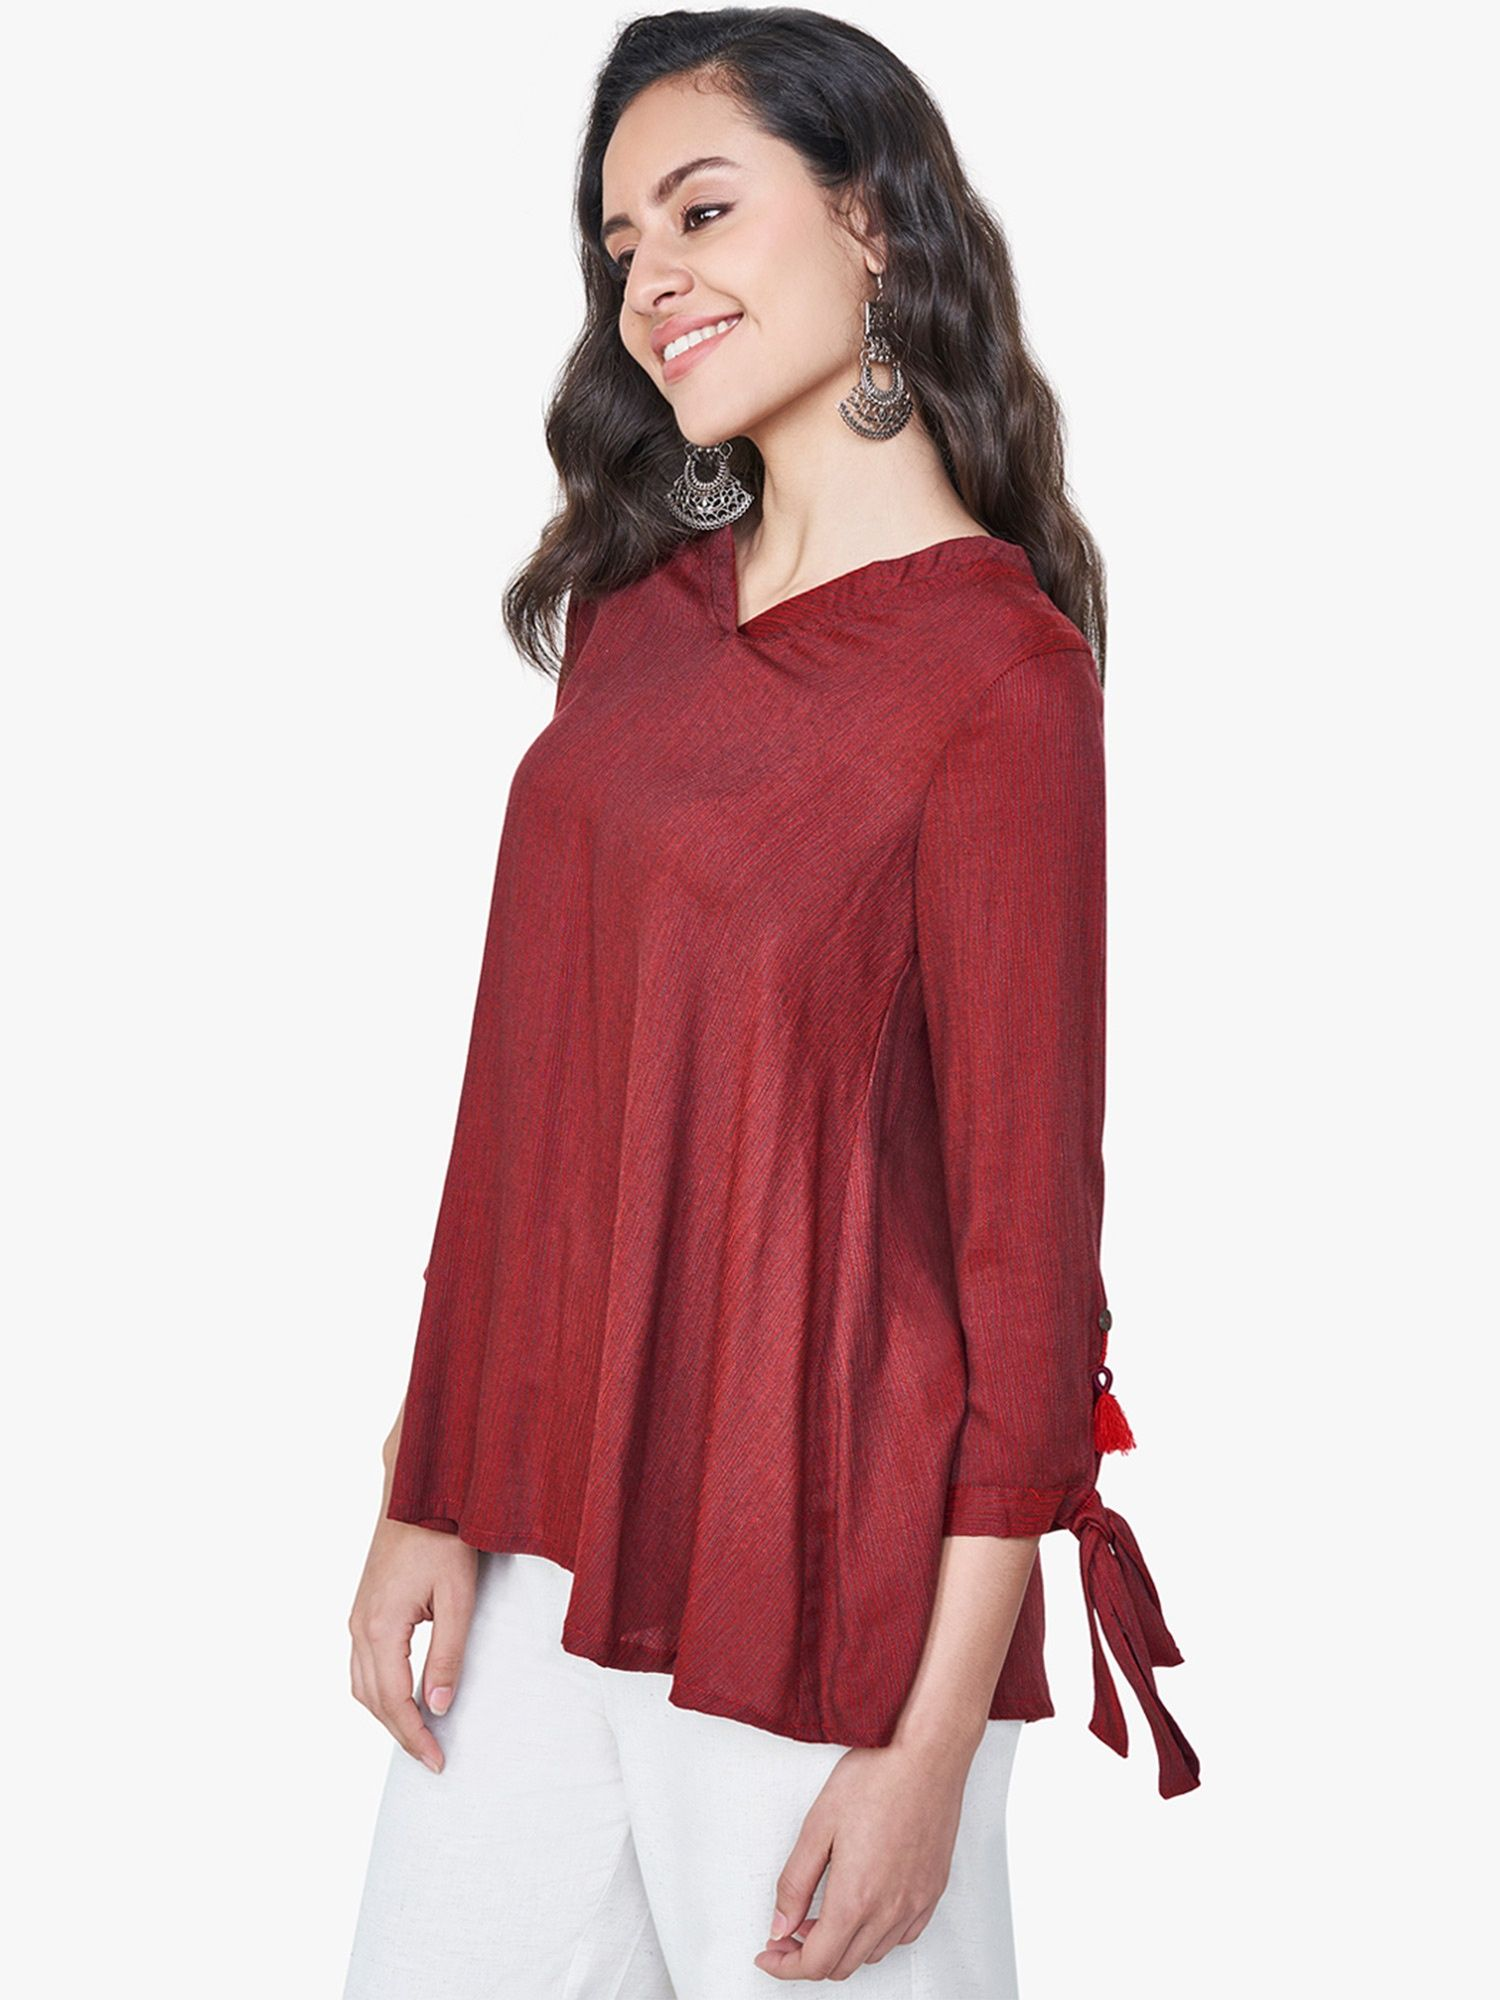 ead0fdfb4e2 Global Desi Shirts Tops and Crop Tops : Buy Global Desi Red Chevron ...